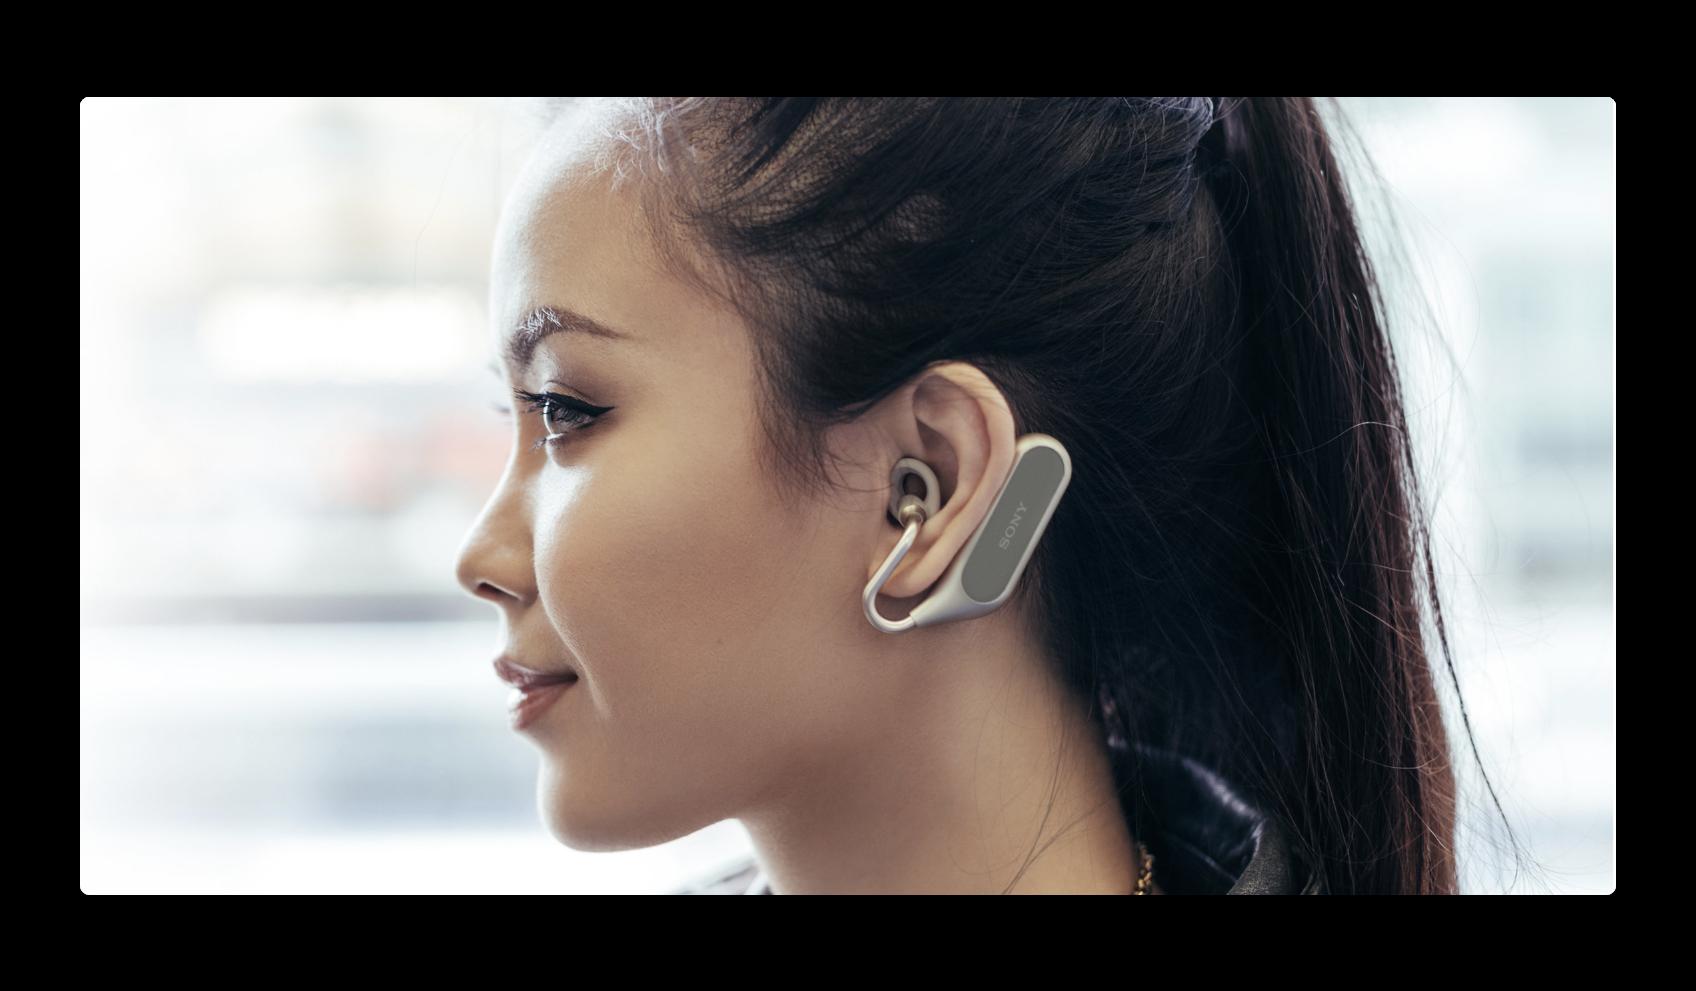 Sonyは、AppleのSiri対応のワイヤレスイヤホン「Xperia Ear Duo」を発表